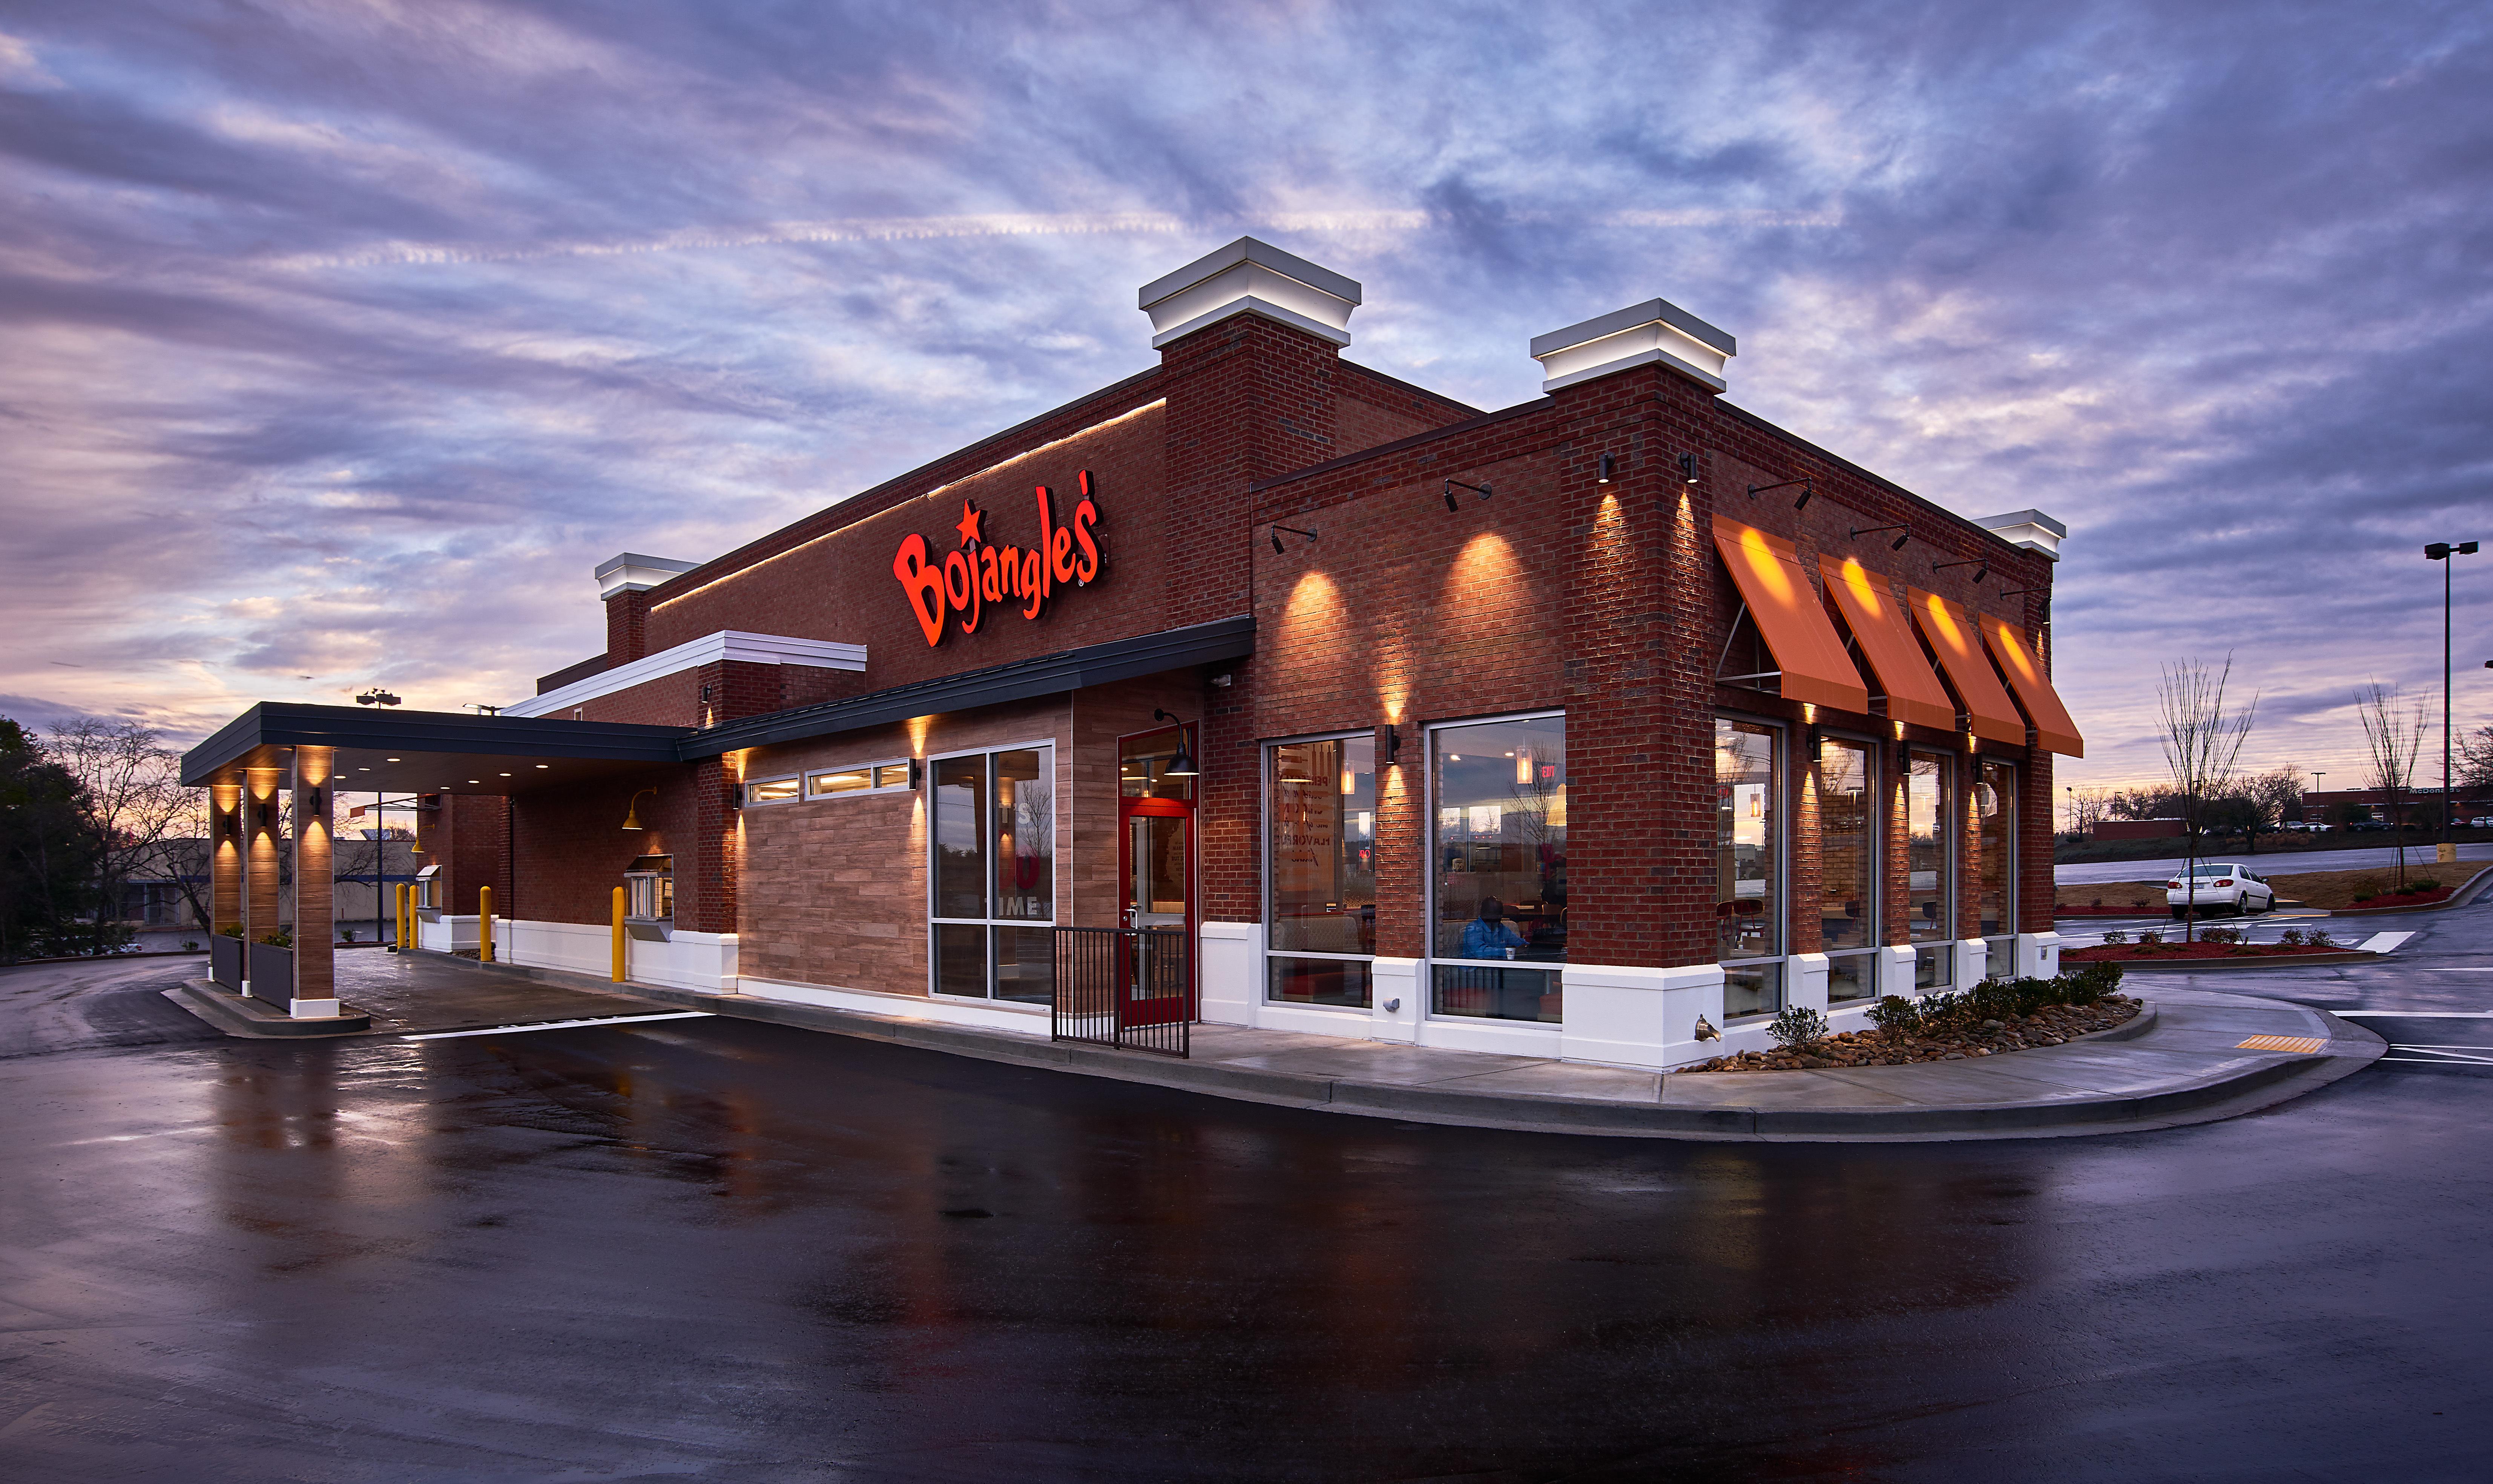 mrm franchise feed: morano gelato's first franchise, shell shack